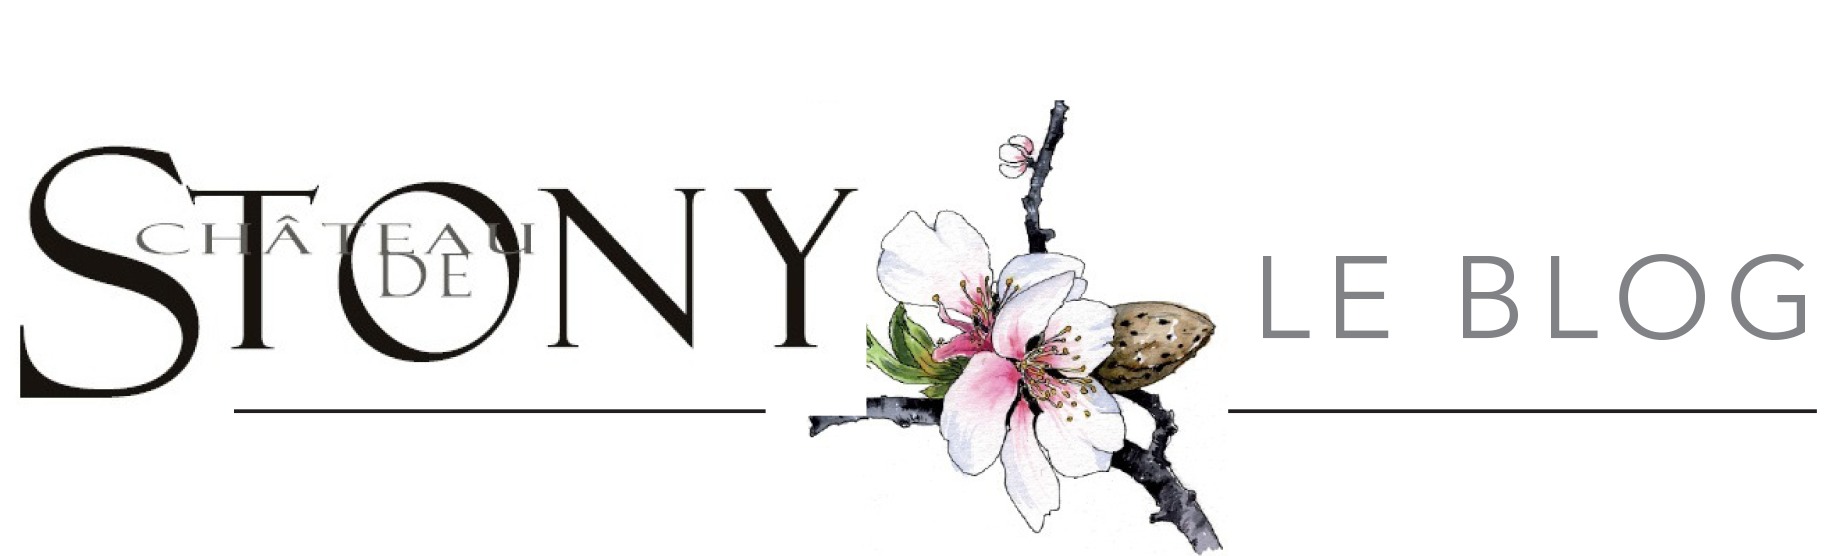 Le blog de Stony